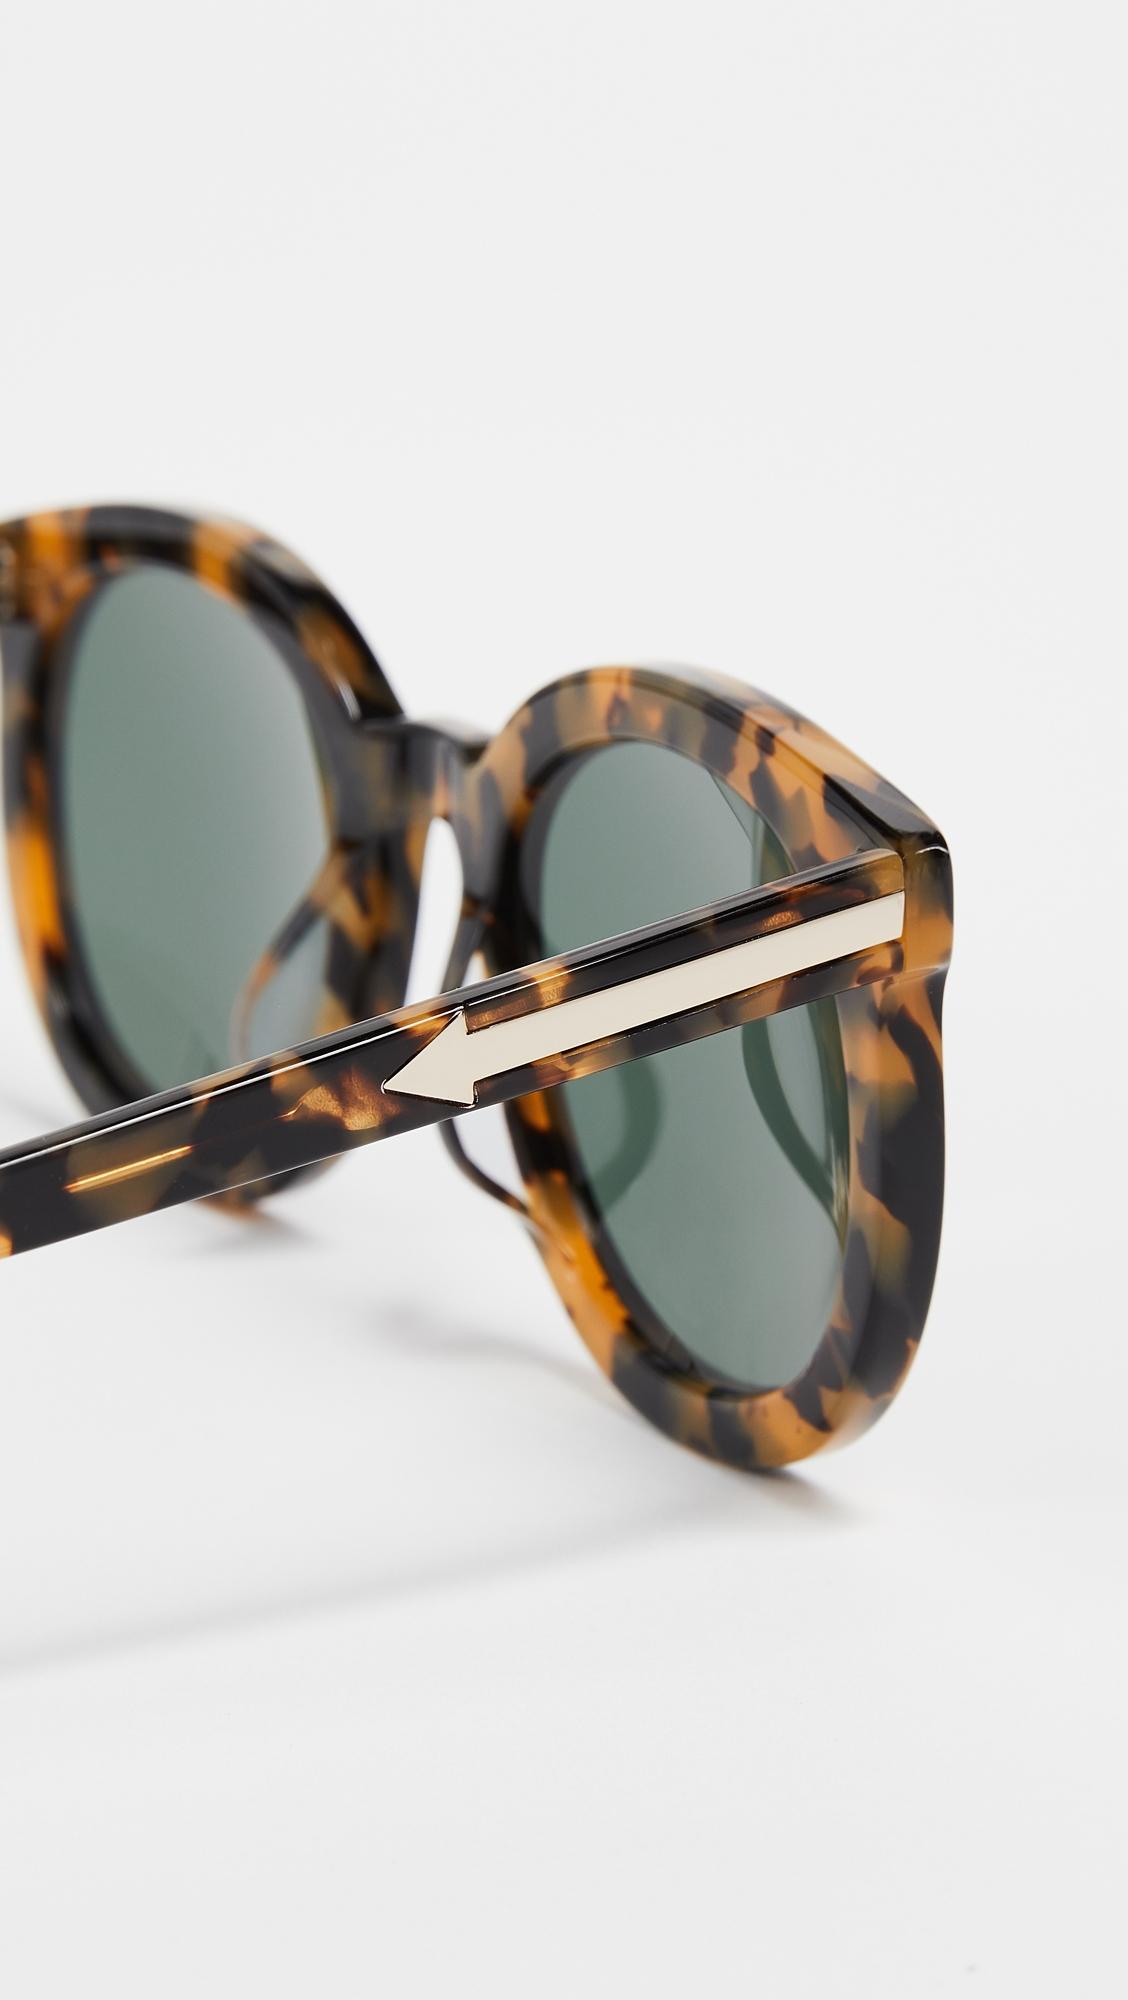 Солнцезащитные очки Super Duper Strength Karen Walker  (KWALK4009966156314)